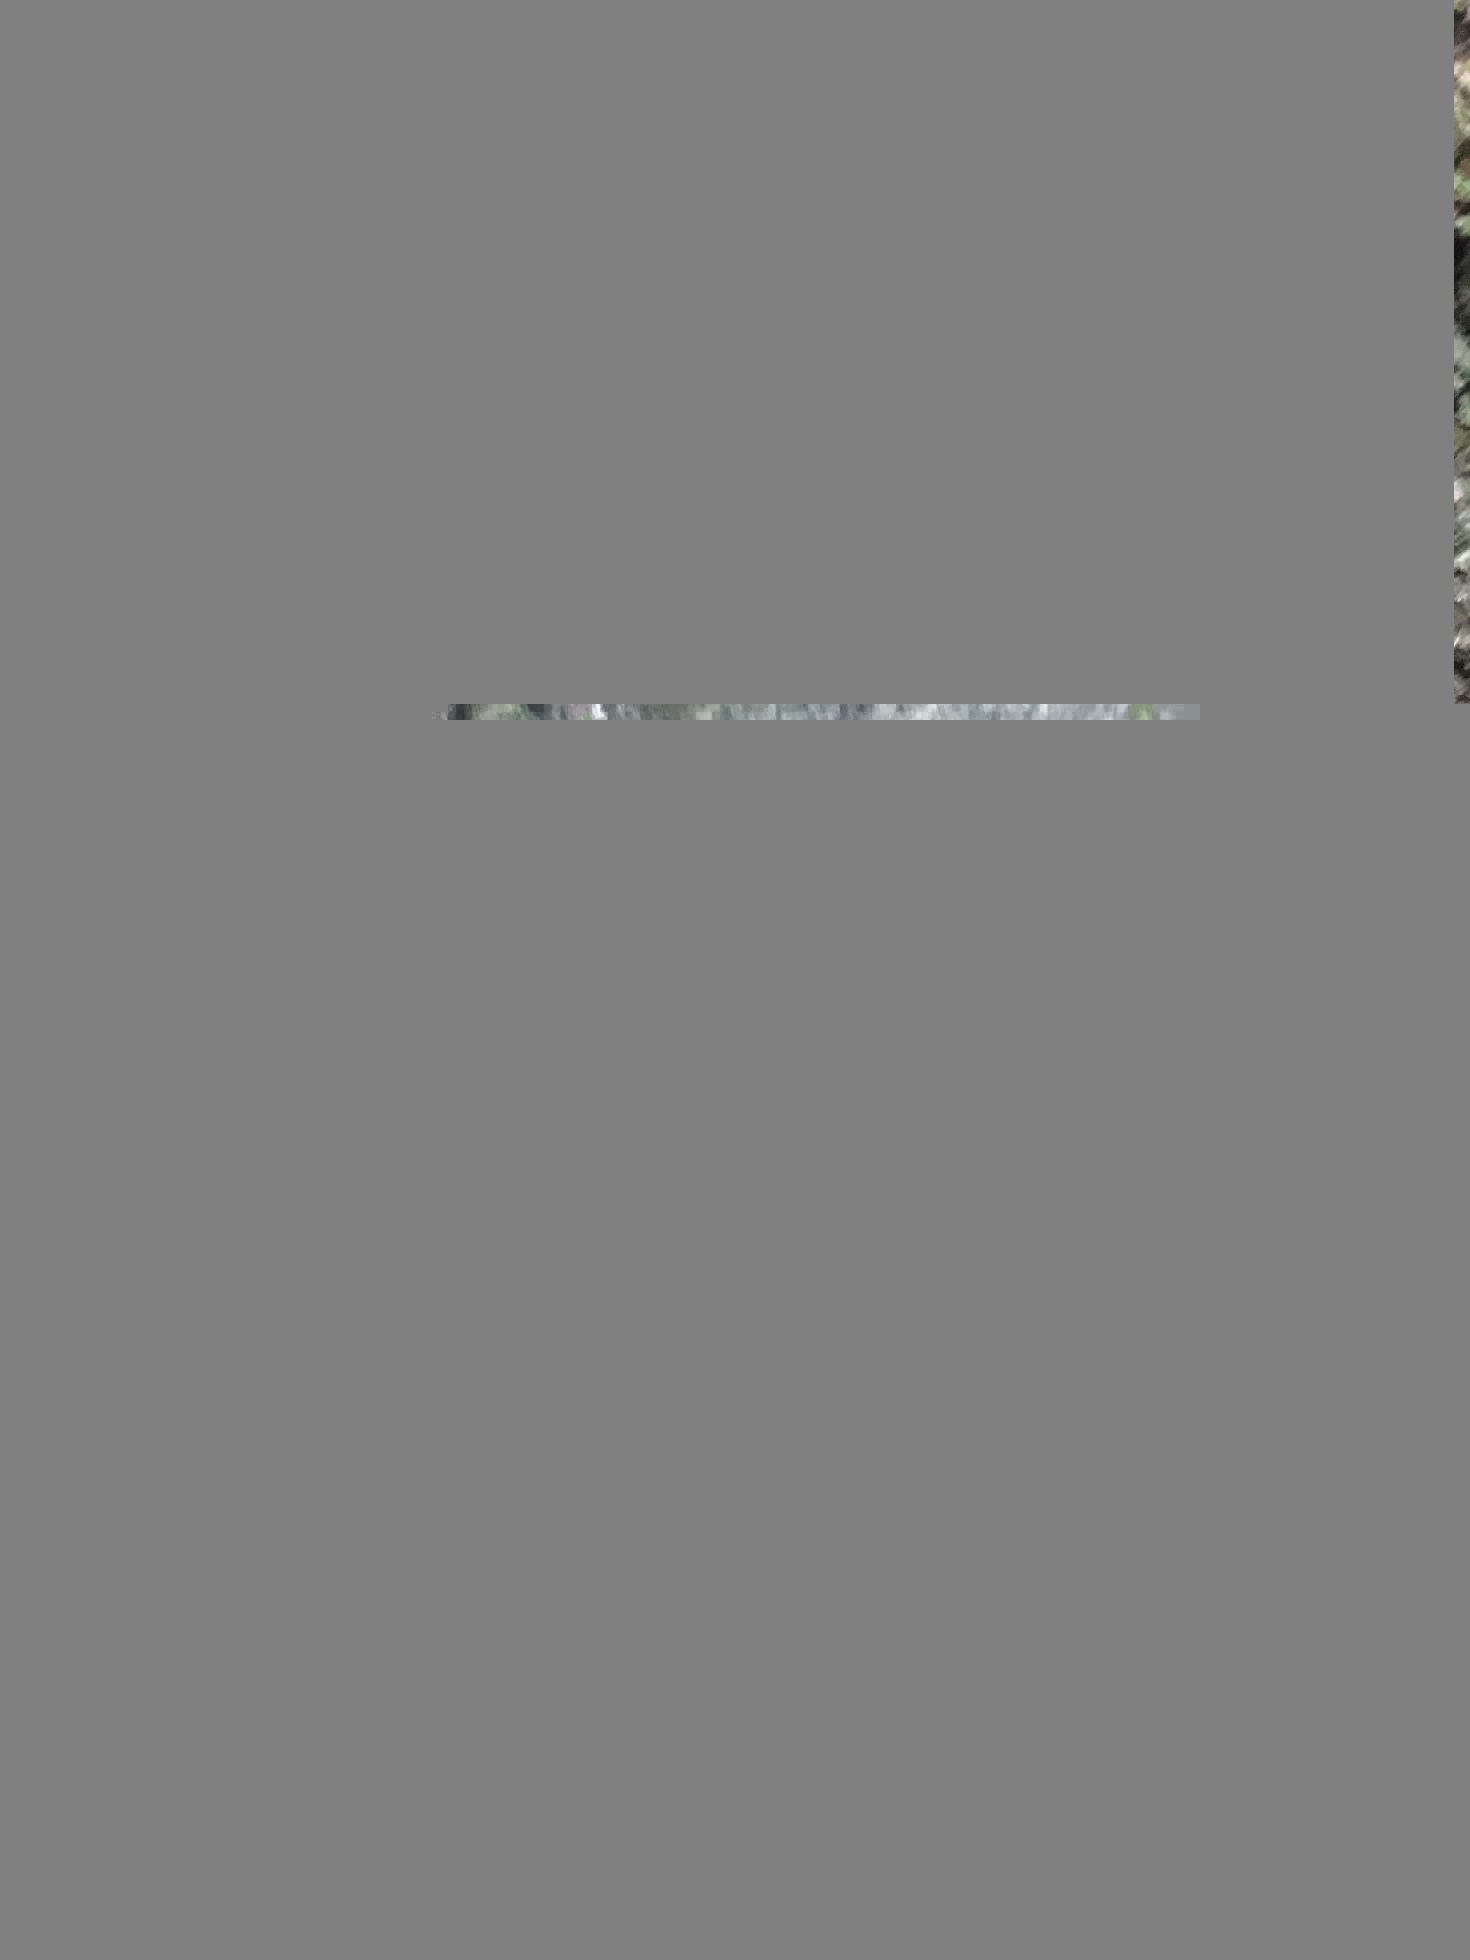 33930808-E6D4-4BE1-B936-AAA0F983E086.jpeg